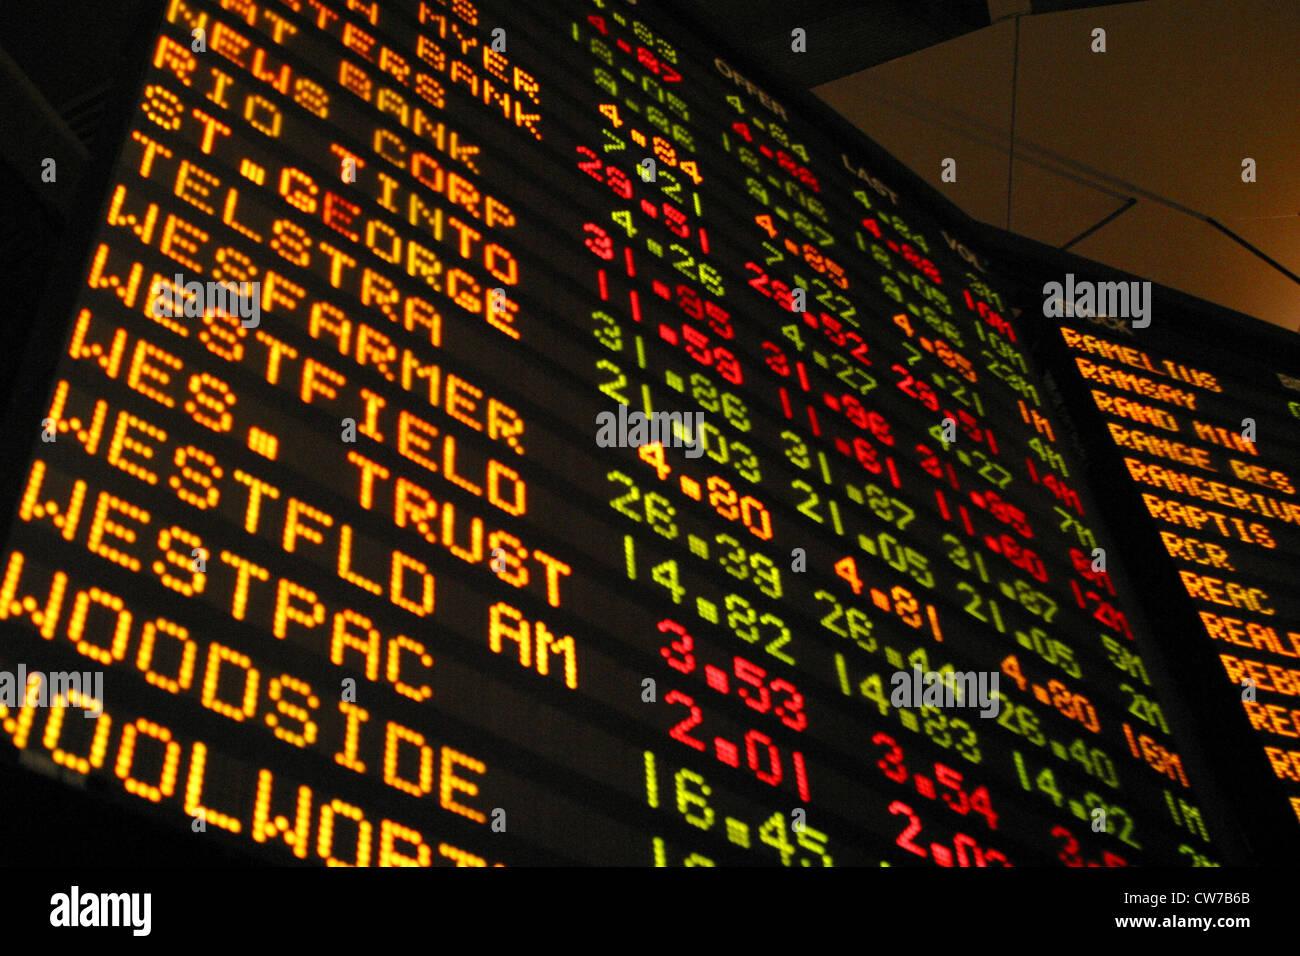 chart at stock market - Stock Image